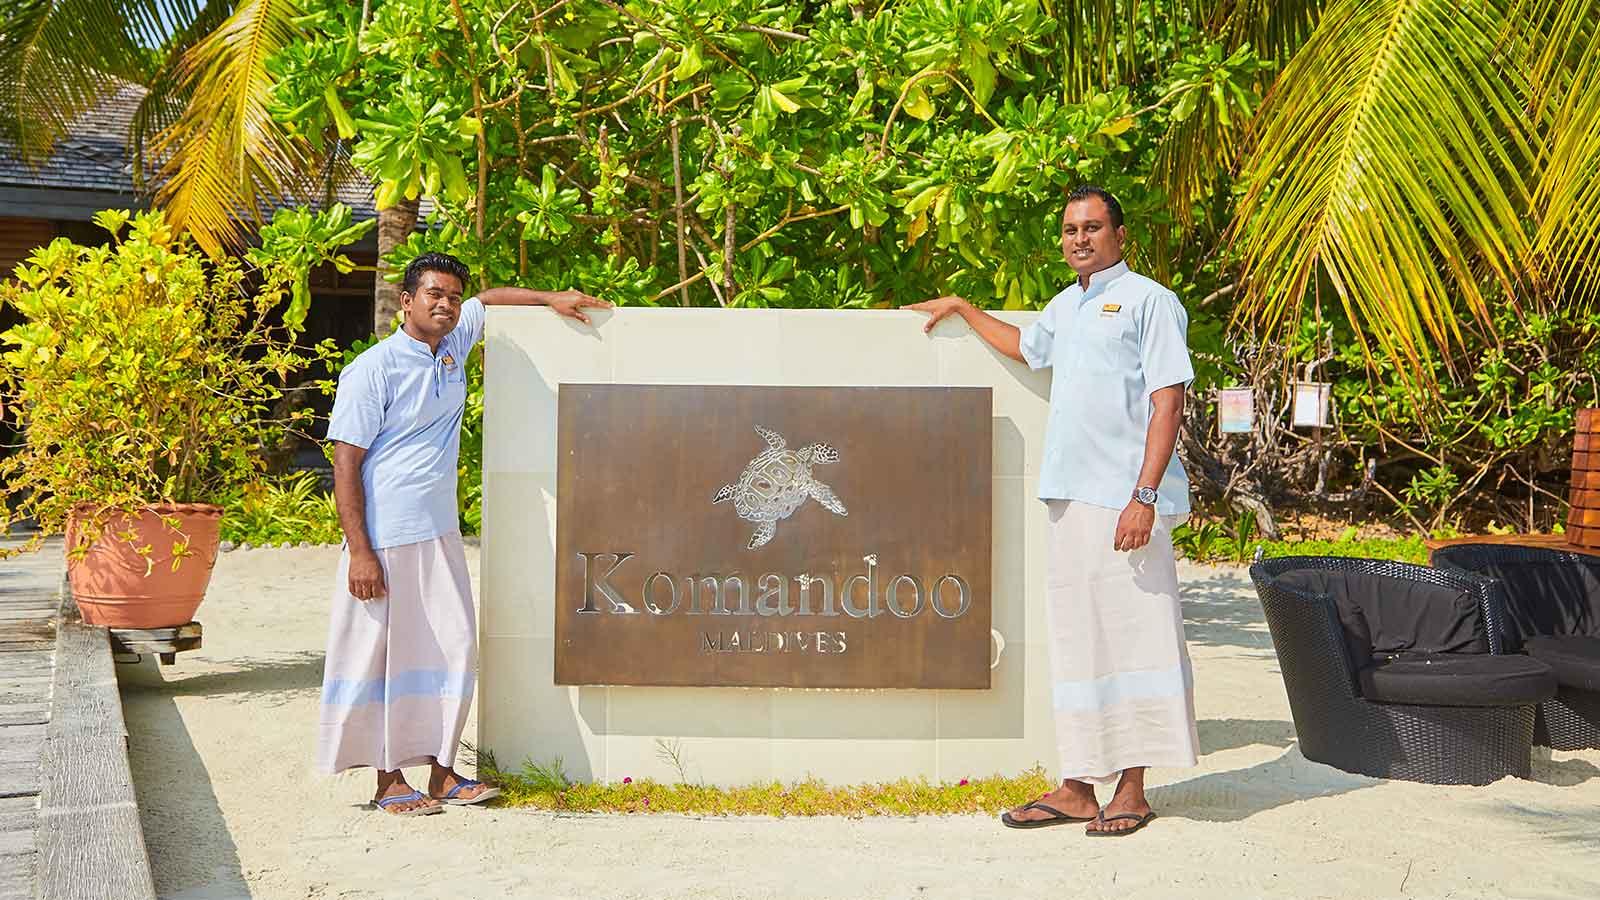 Komandoo Maldives Champions